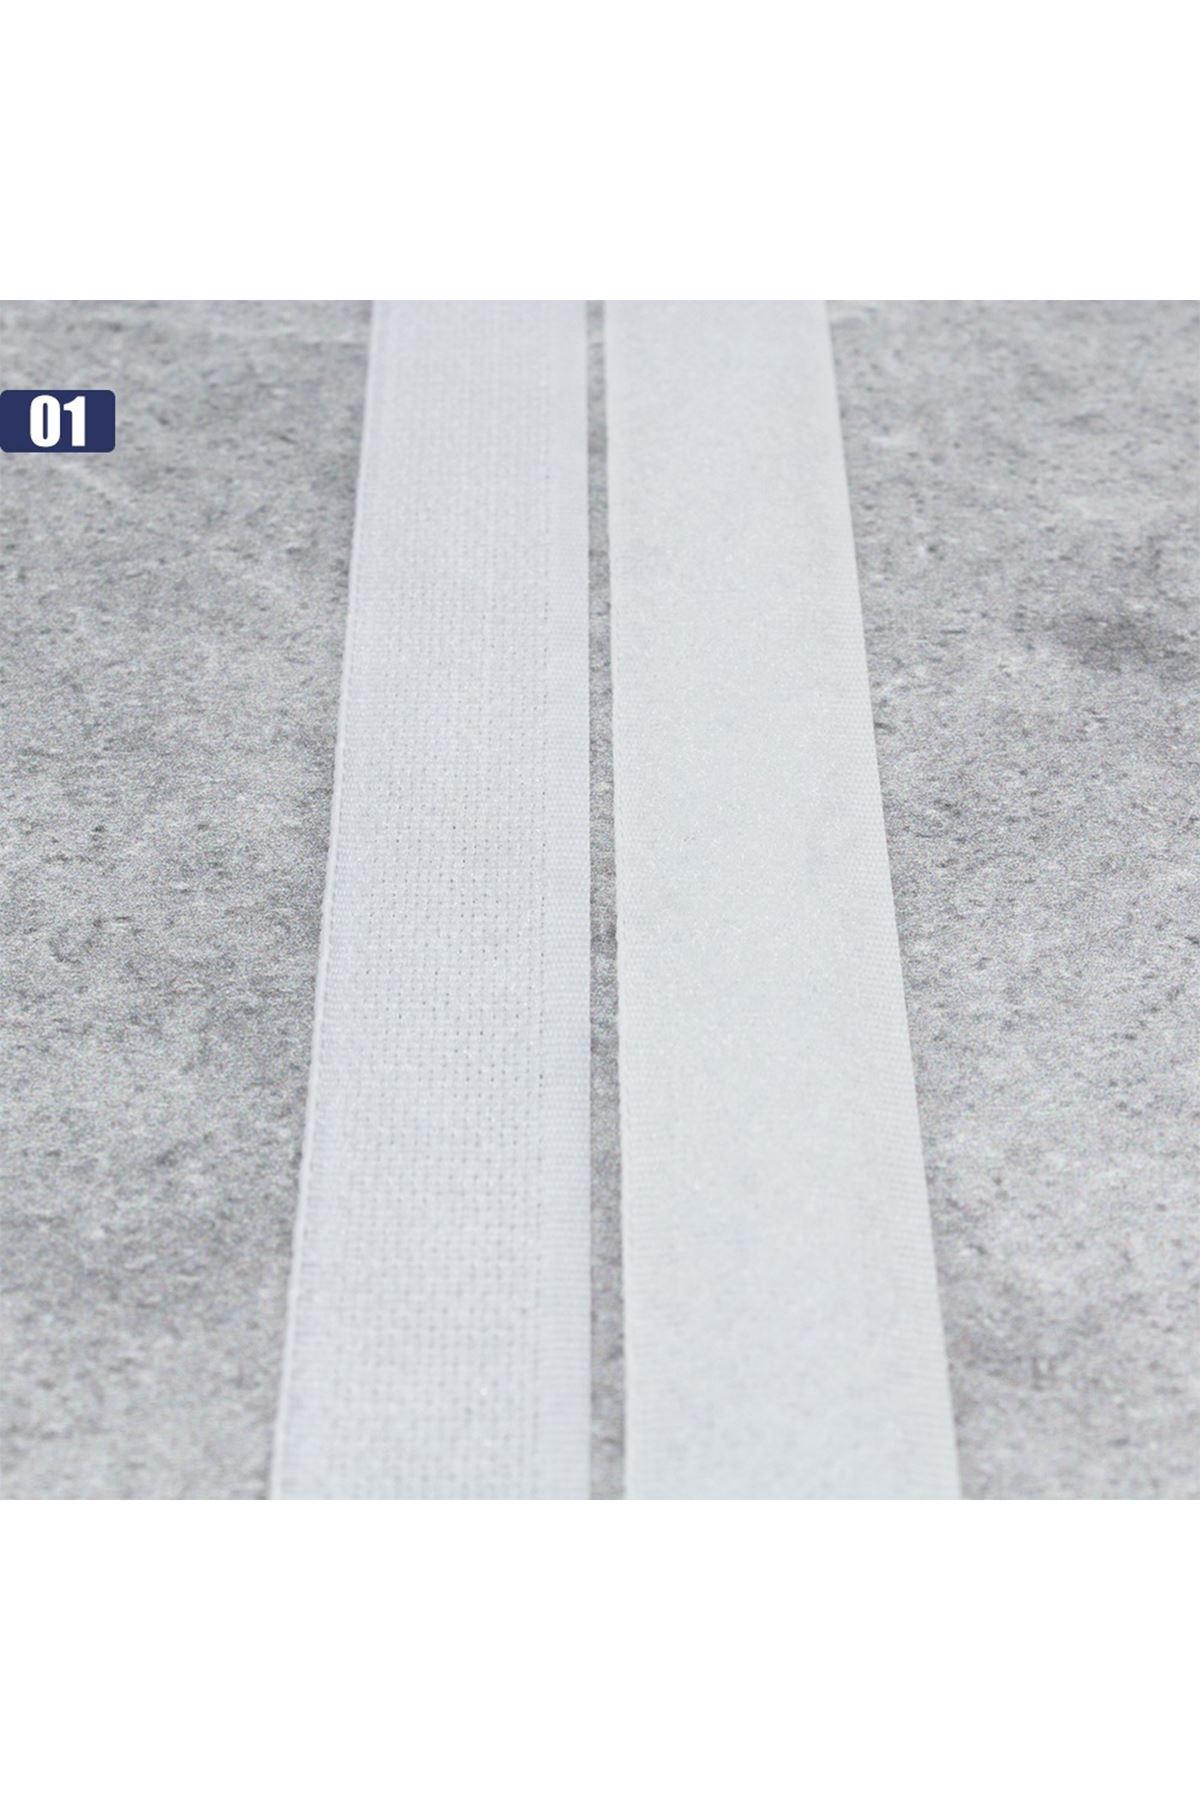 1 Metre Cırt Bant 01